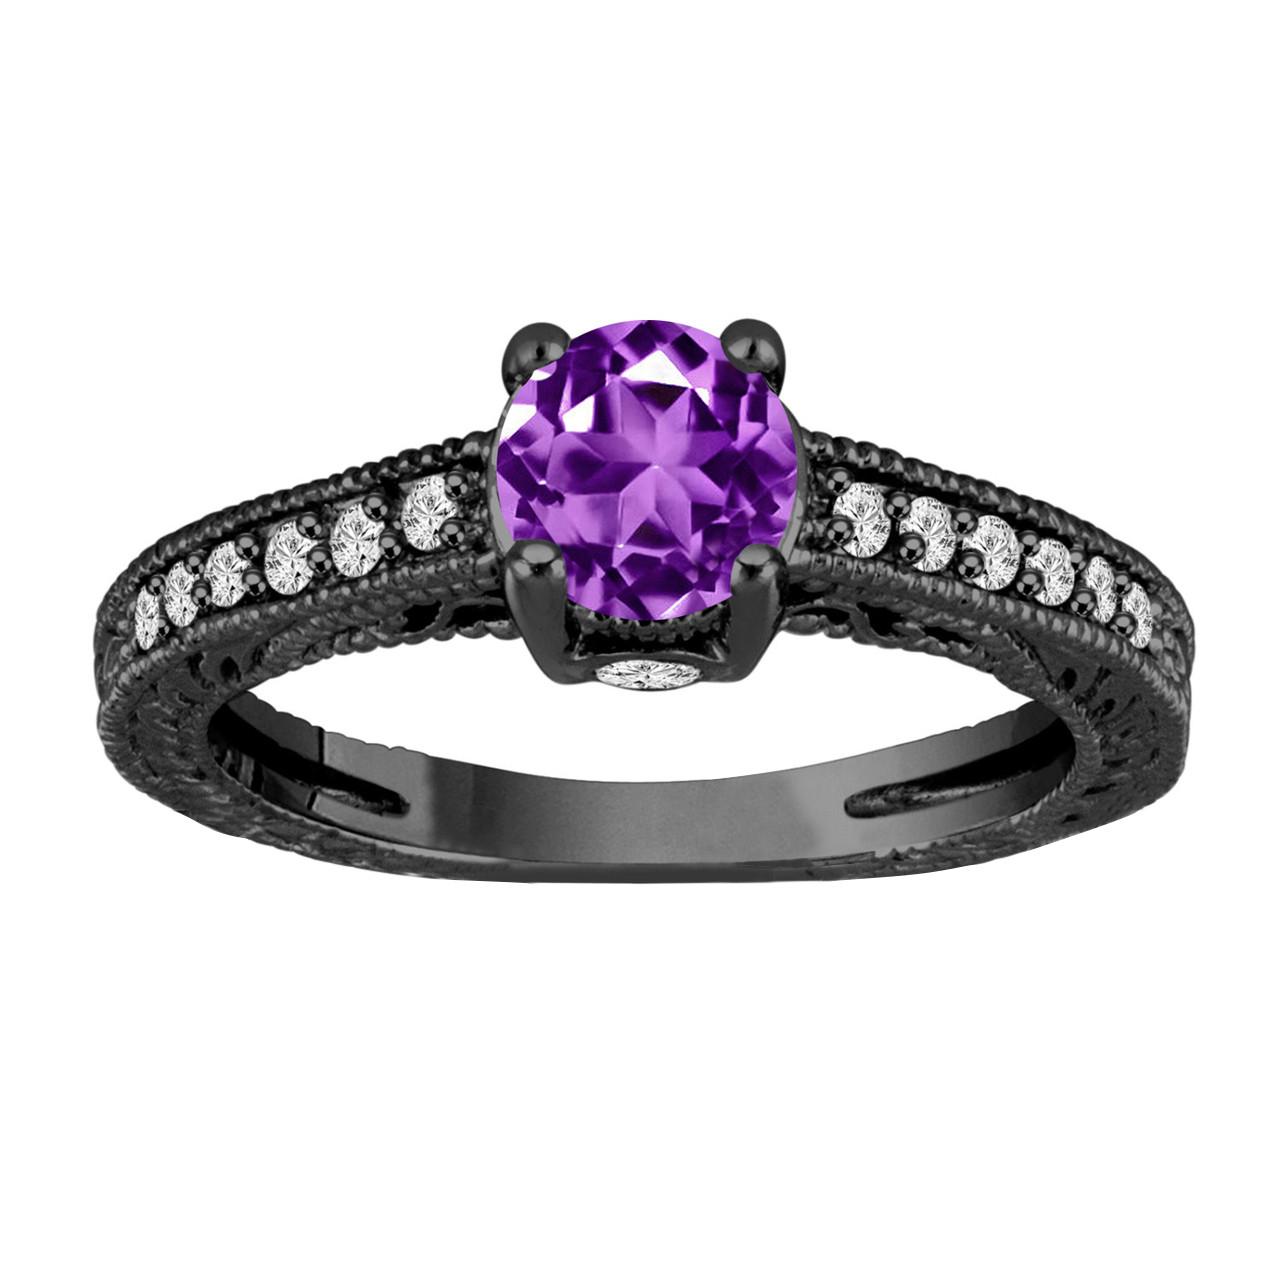 120 carat purple amethyst engagement ring wedding ring